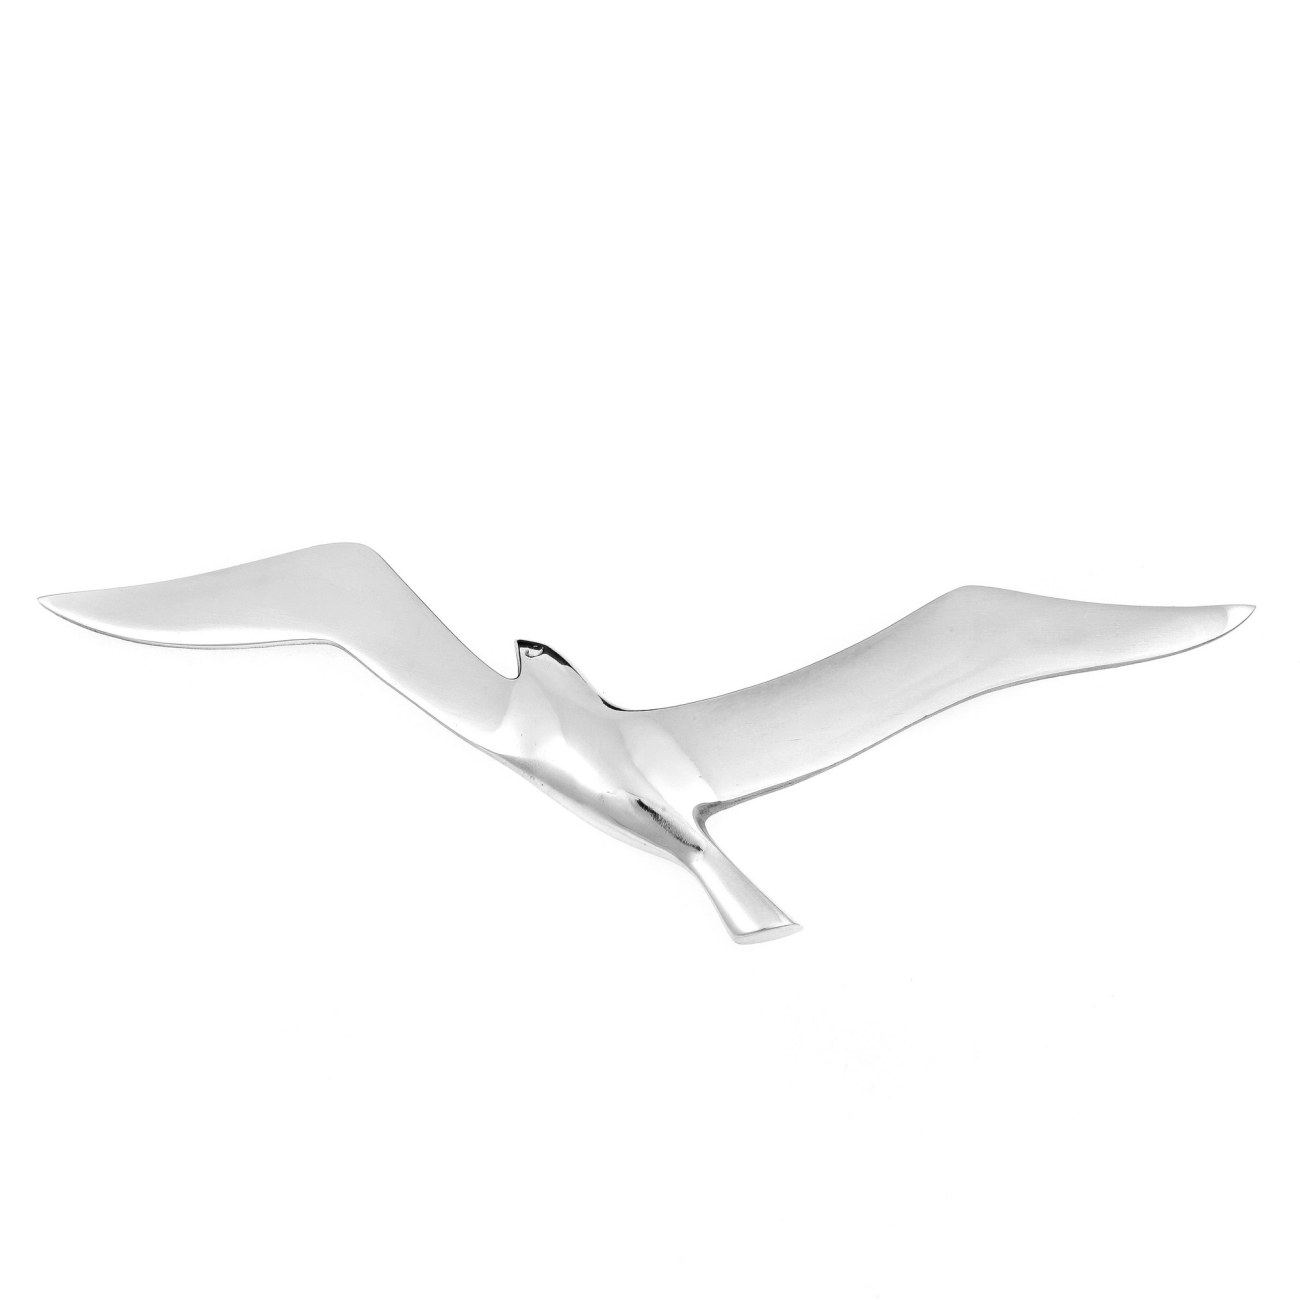 Flying Seagull Bird